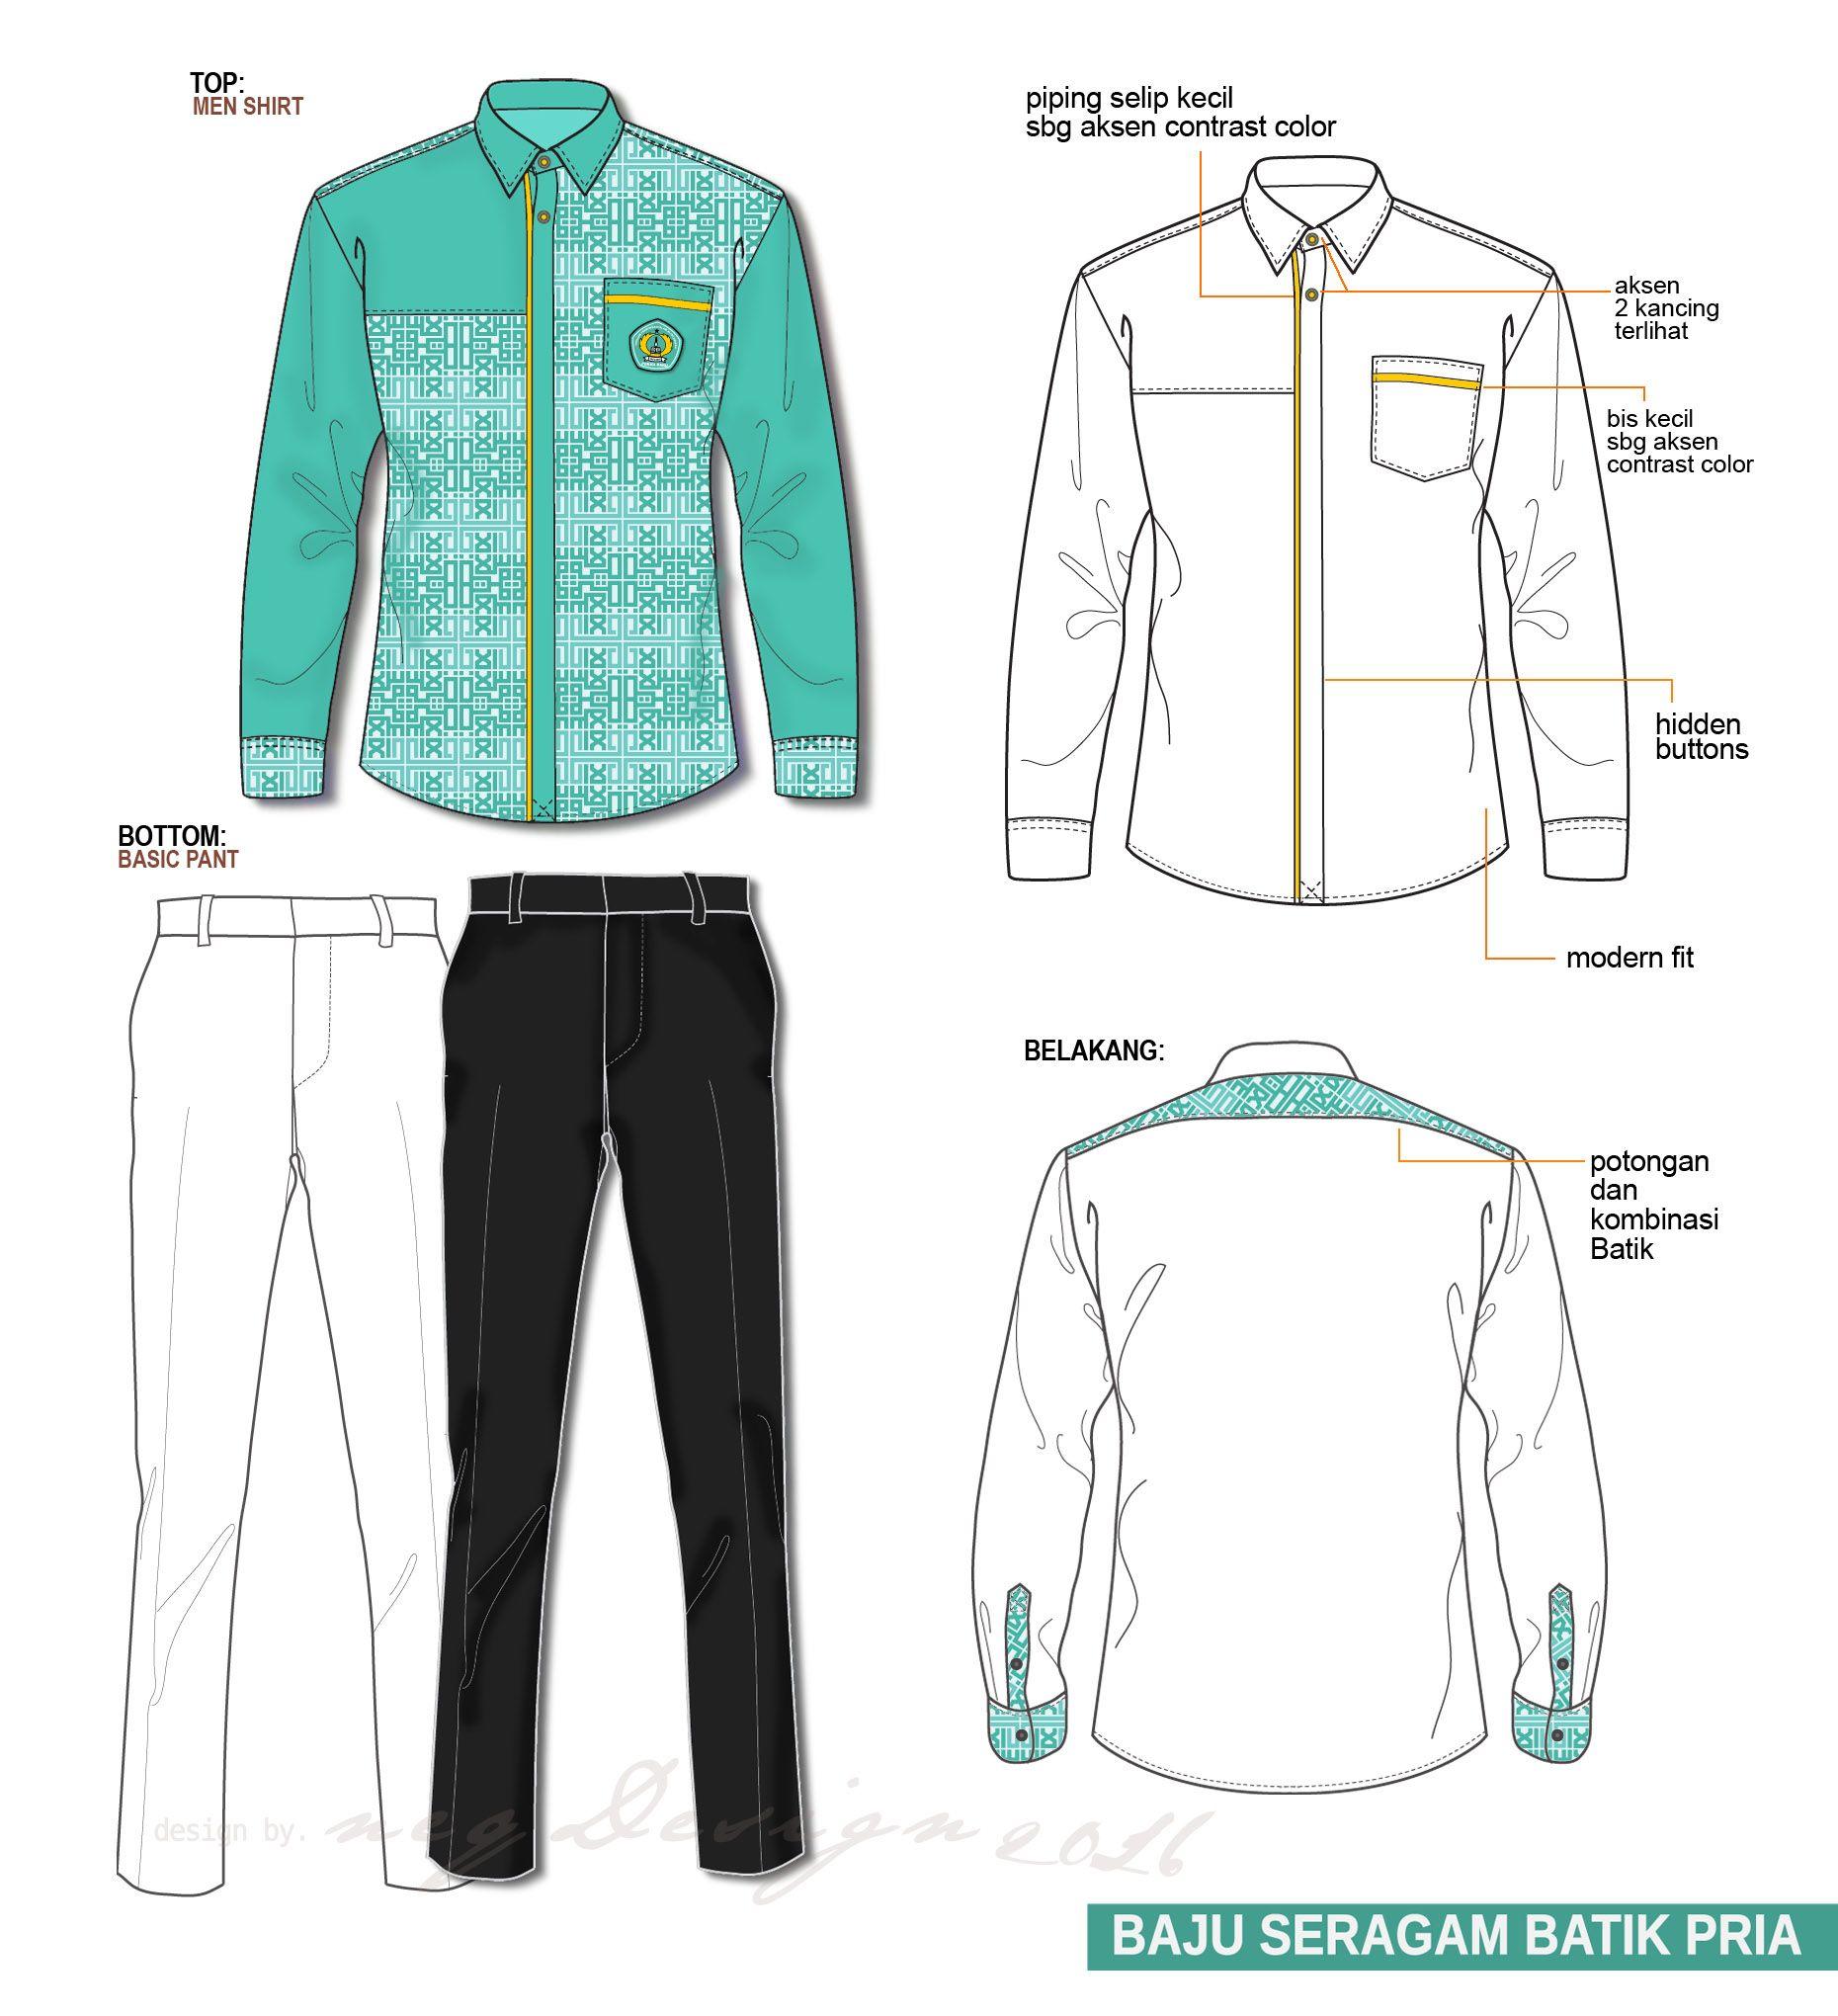 1860x2040 Desain Baju Seragam Kemeja Pria Men Shirts Batik Shirts